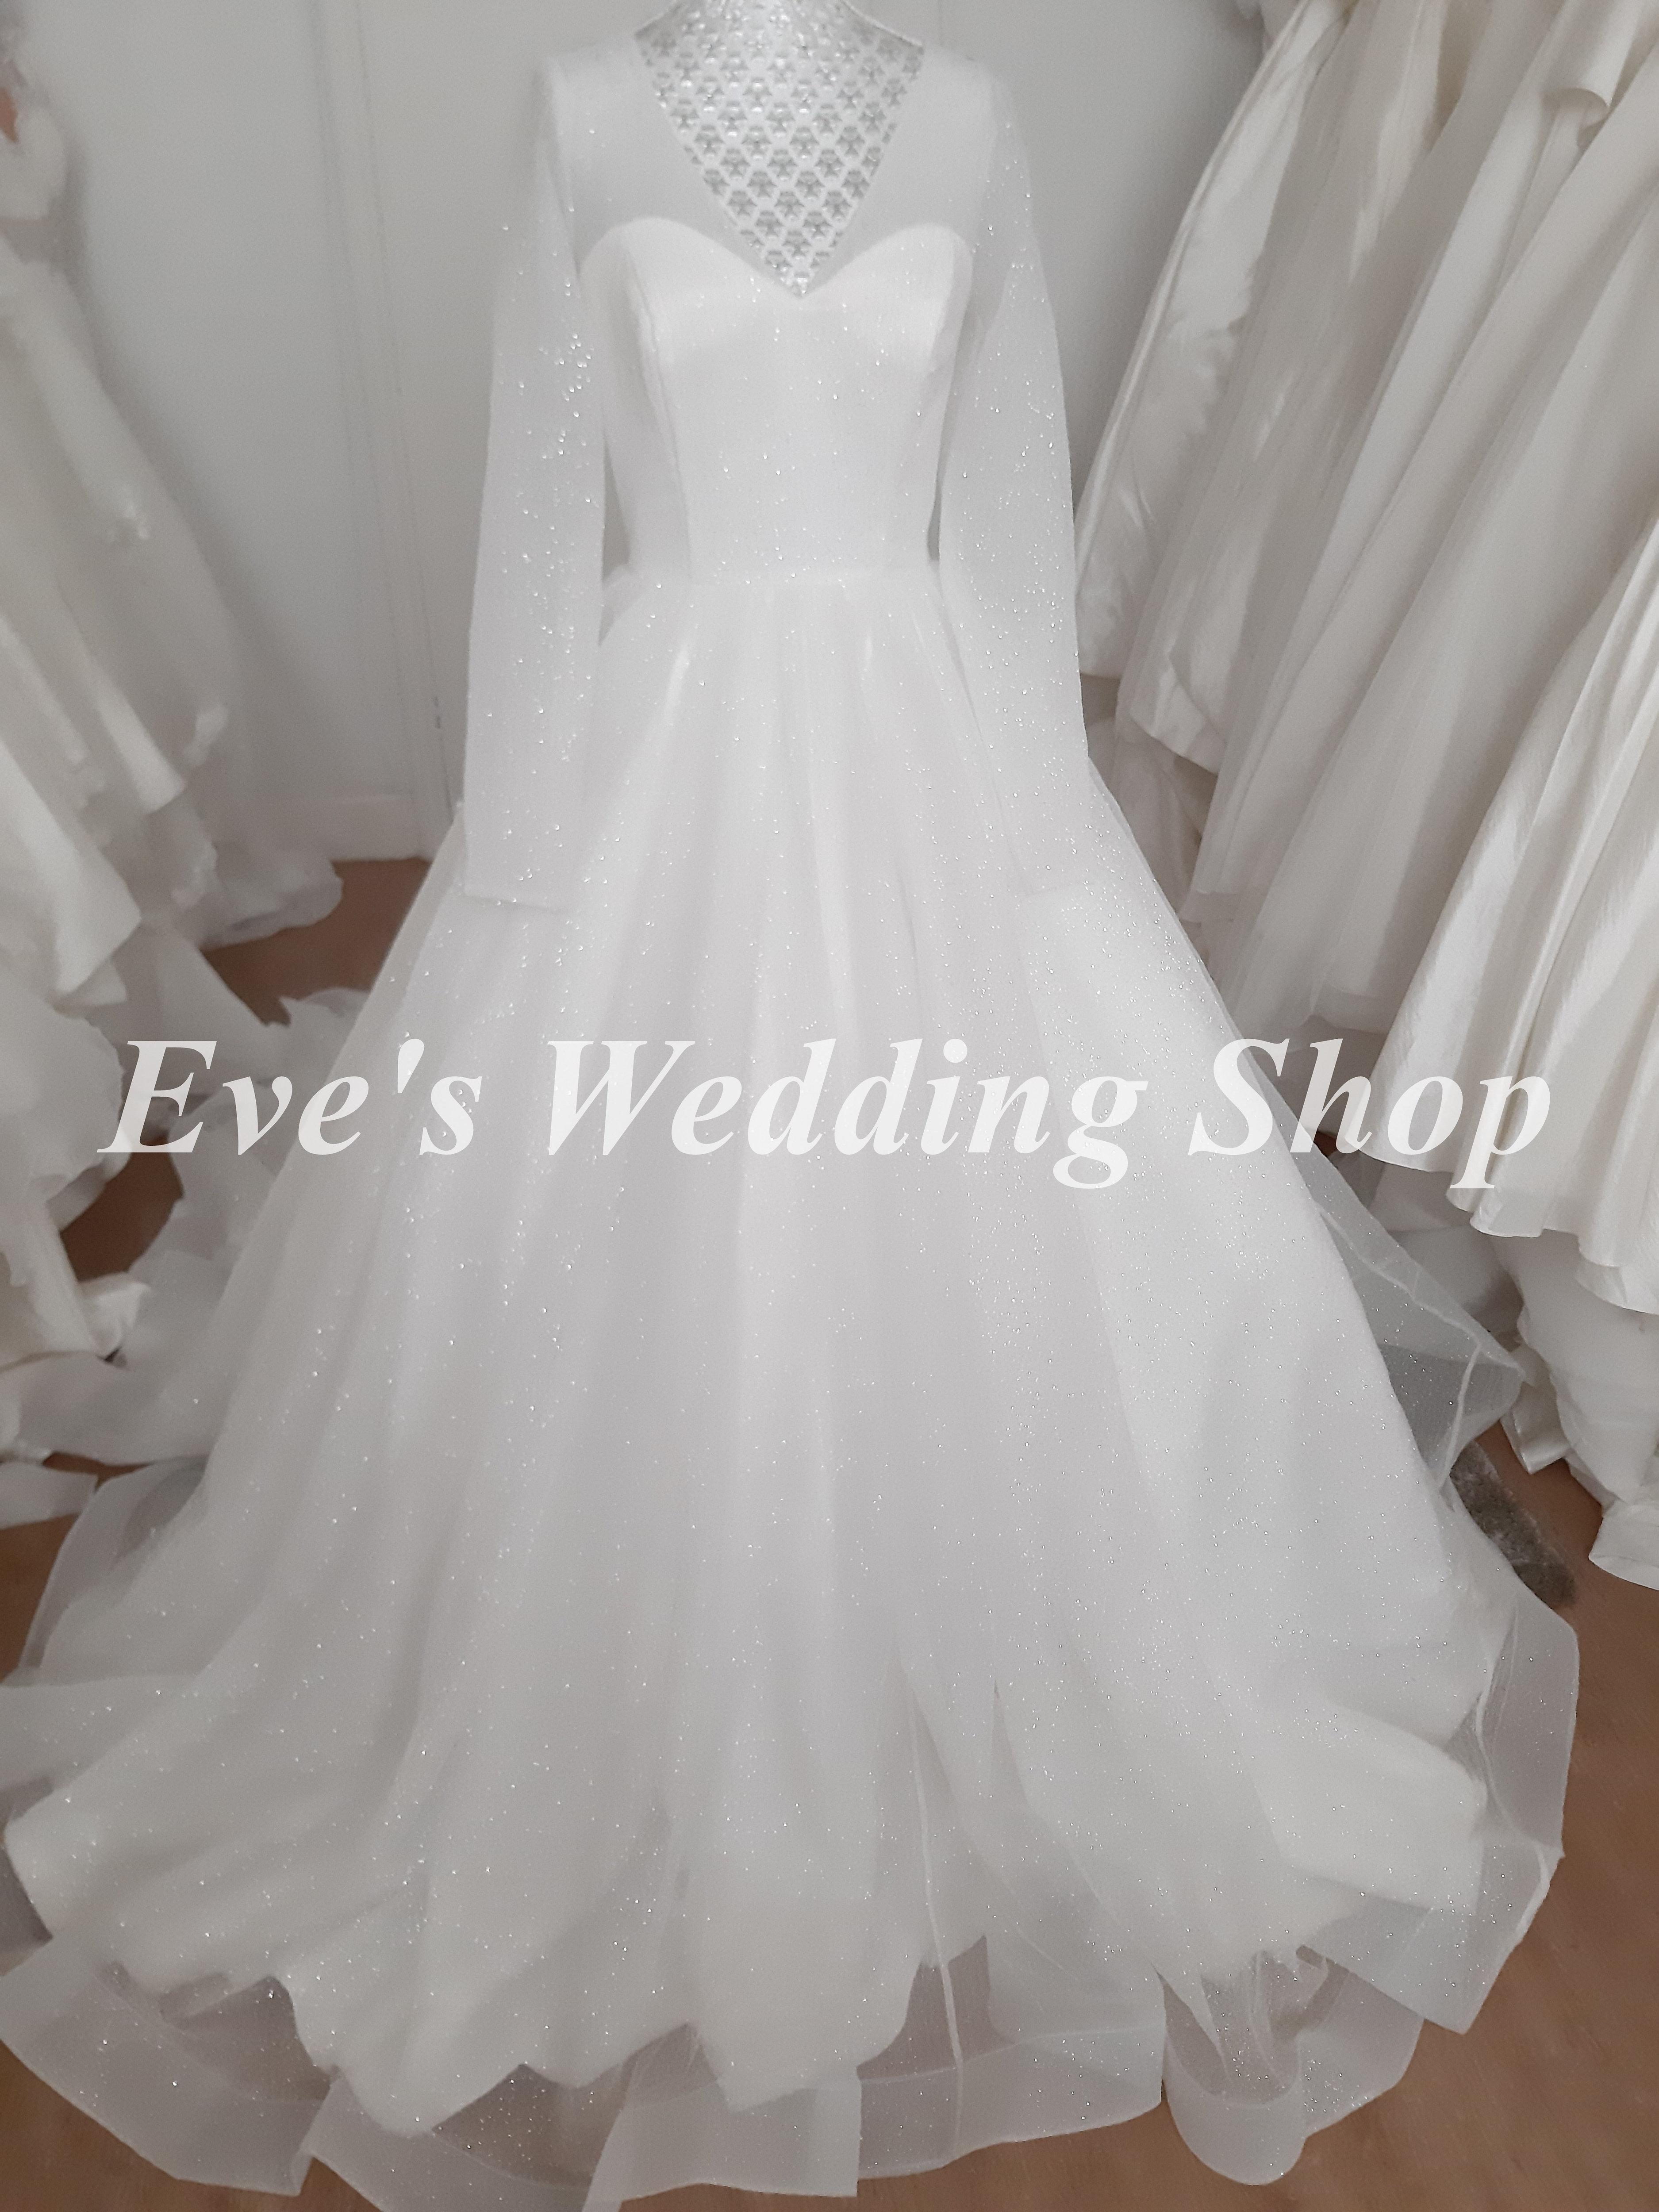 Ylripw3hs 3ham,Mother Of The Bride Dresses For Beach Wedding Uk